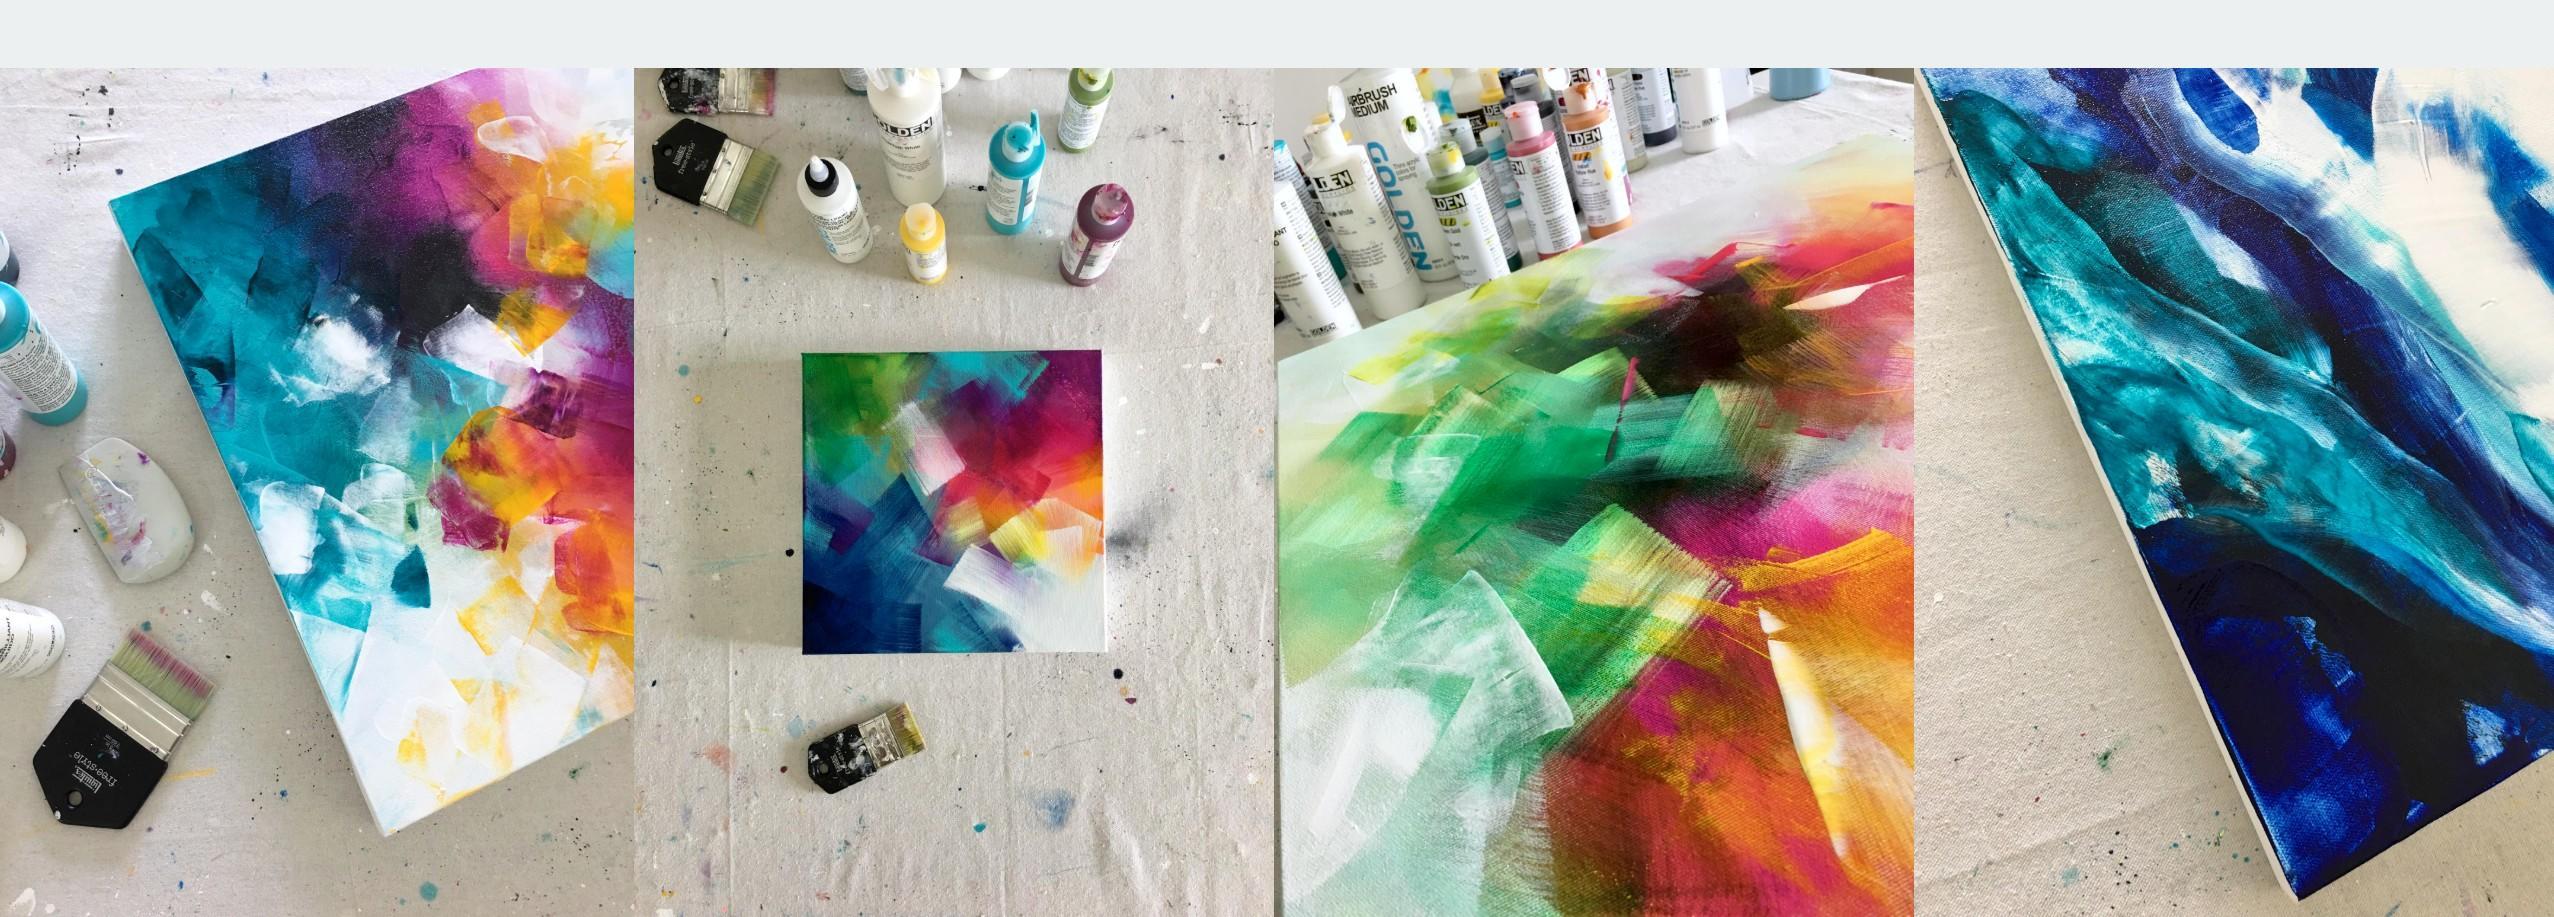 Vibrant Layers With Acrylics Mediums Online Course Deniz Altug